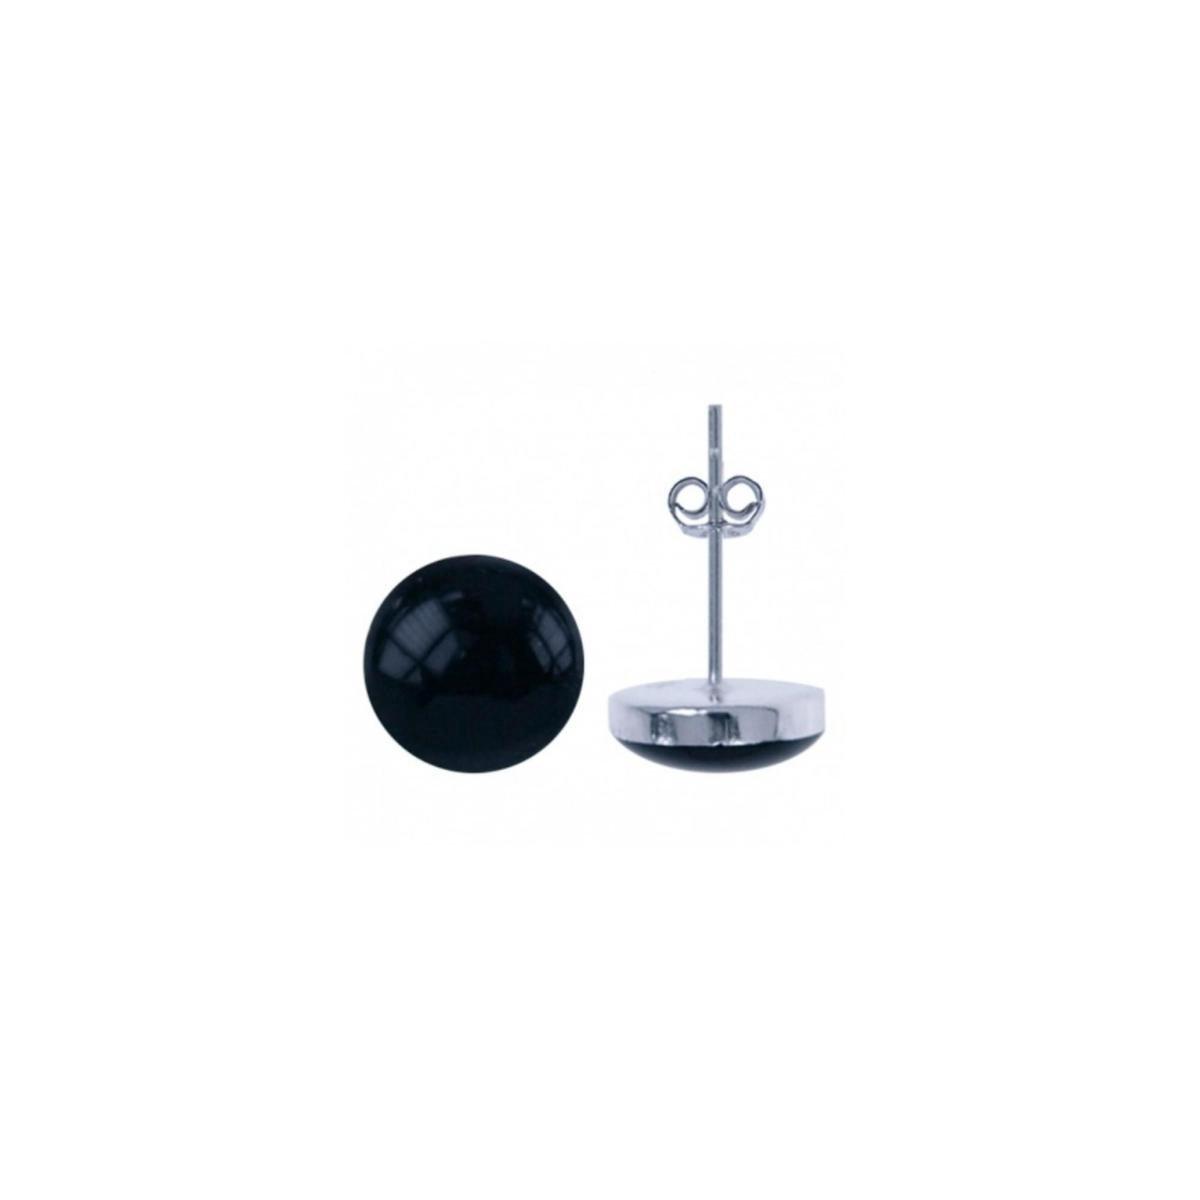 House of Jewels - Zwarte Onyx Oorknopjes met Zilver 6mm - House of Jewels